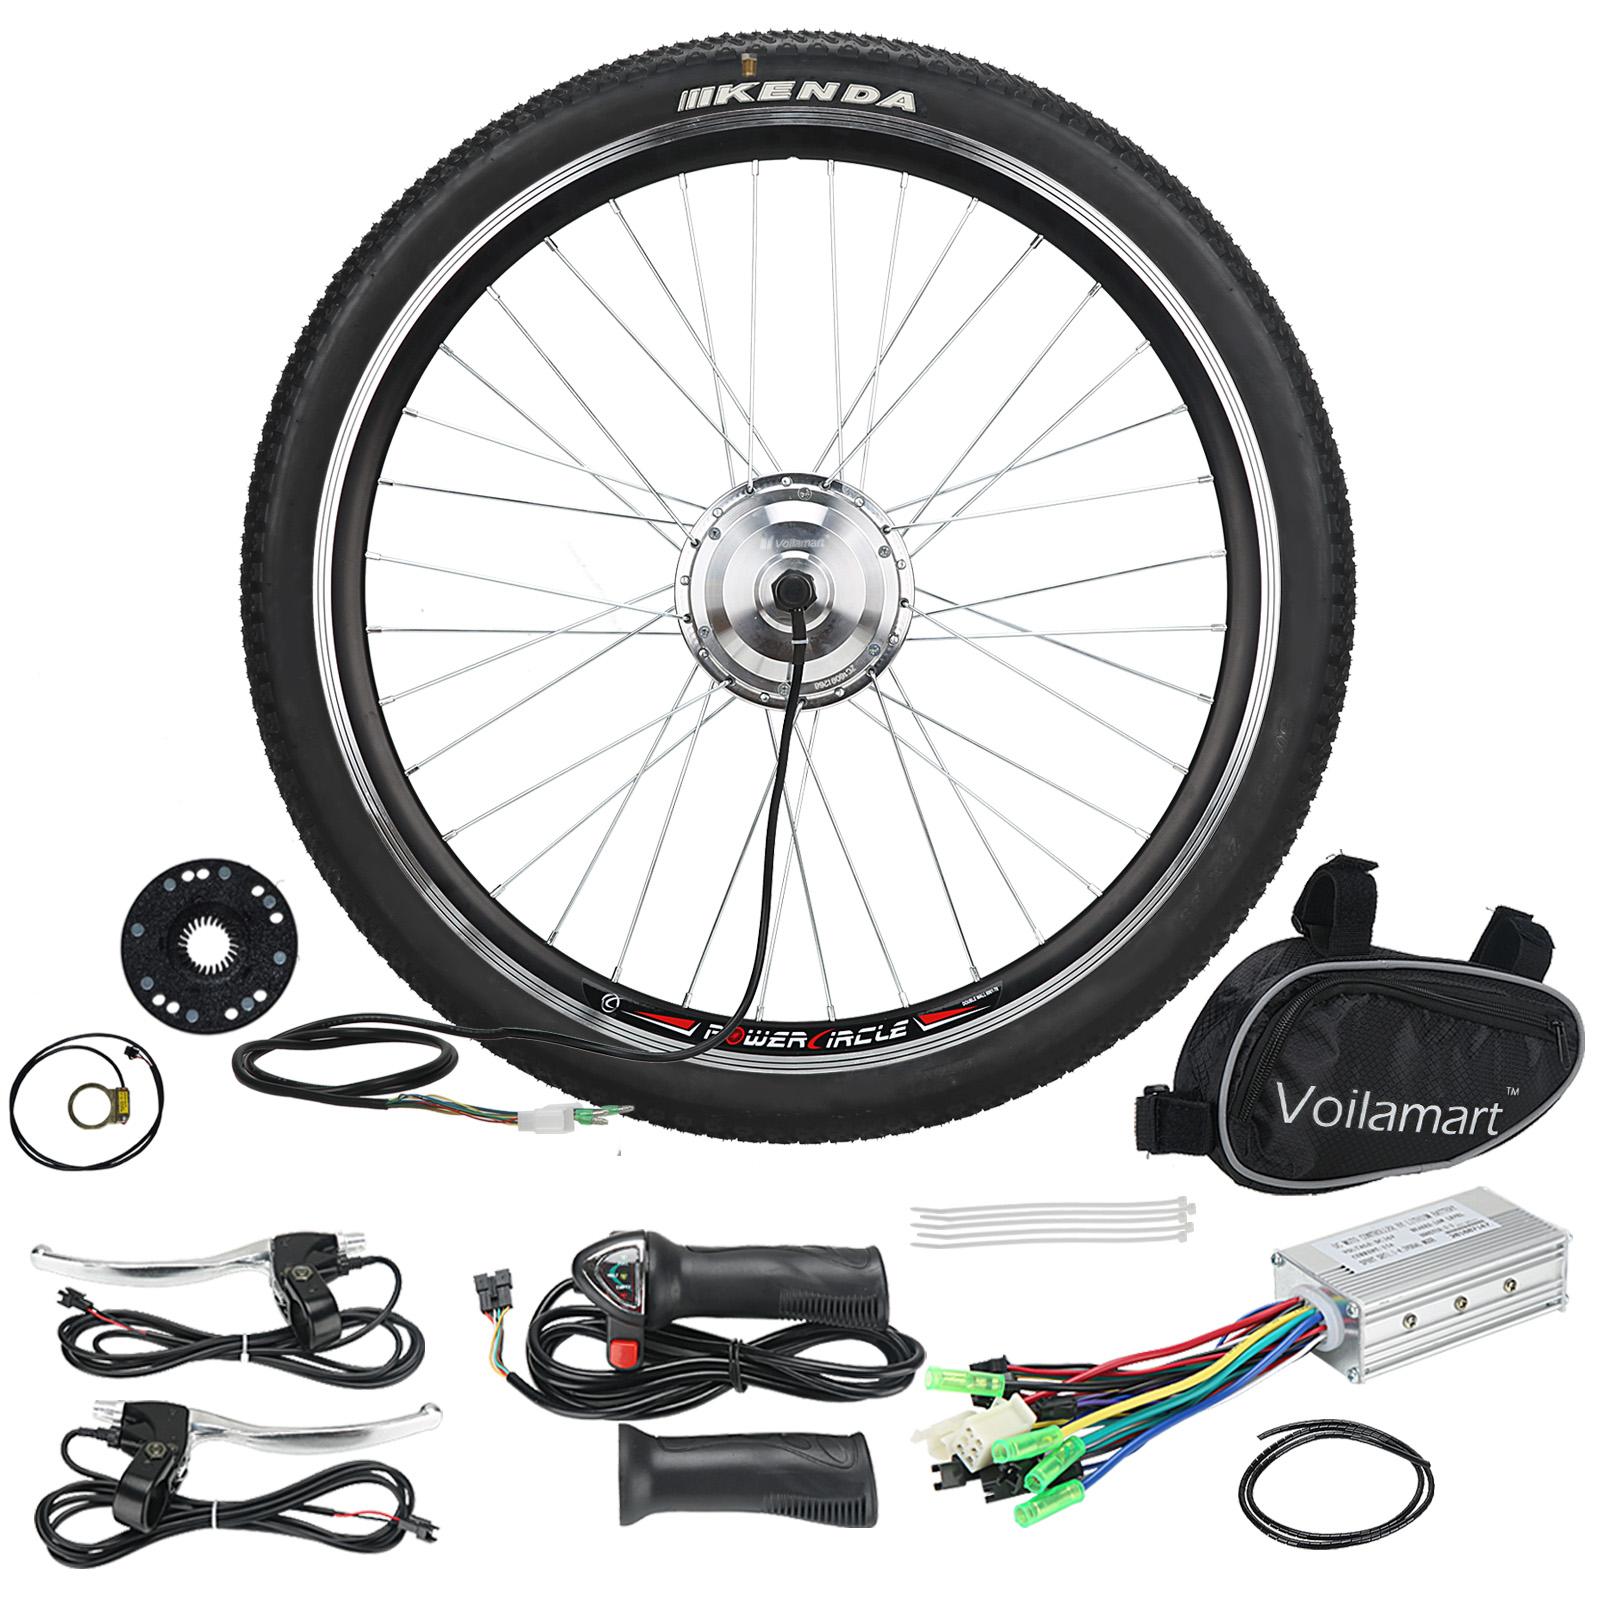 electric bicycle conversion kit e bike 36v 250w motor. Black Bedroom Furniture Sets. Home Design Ideas